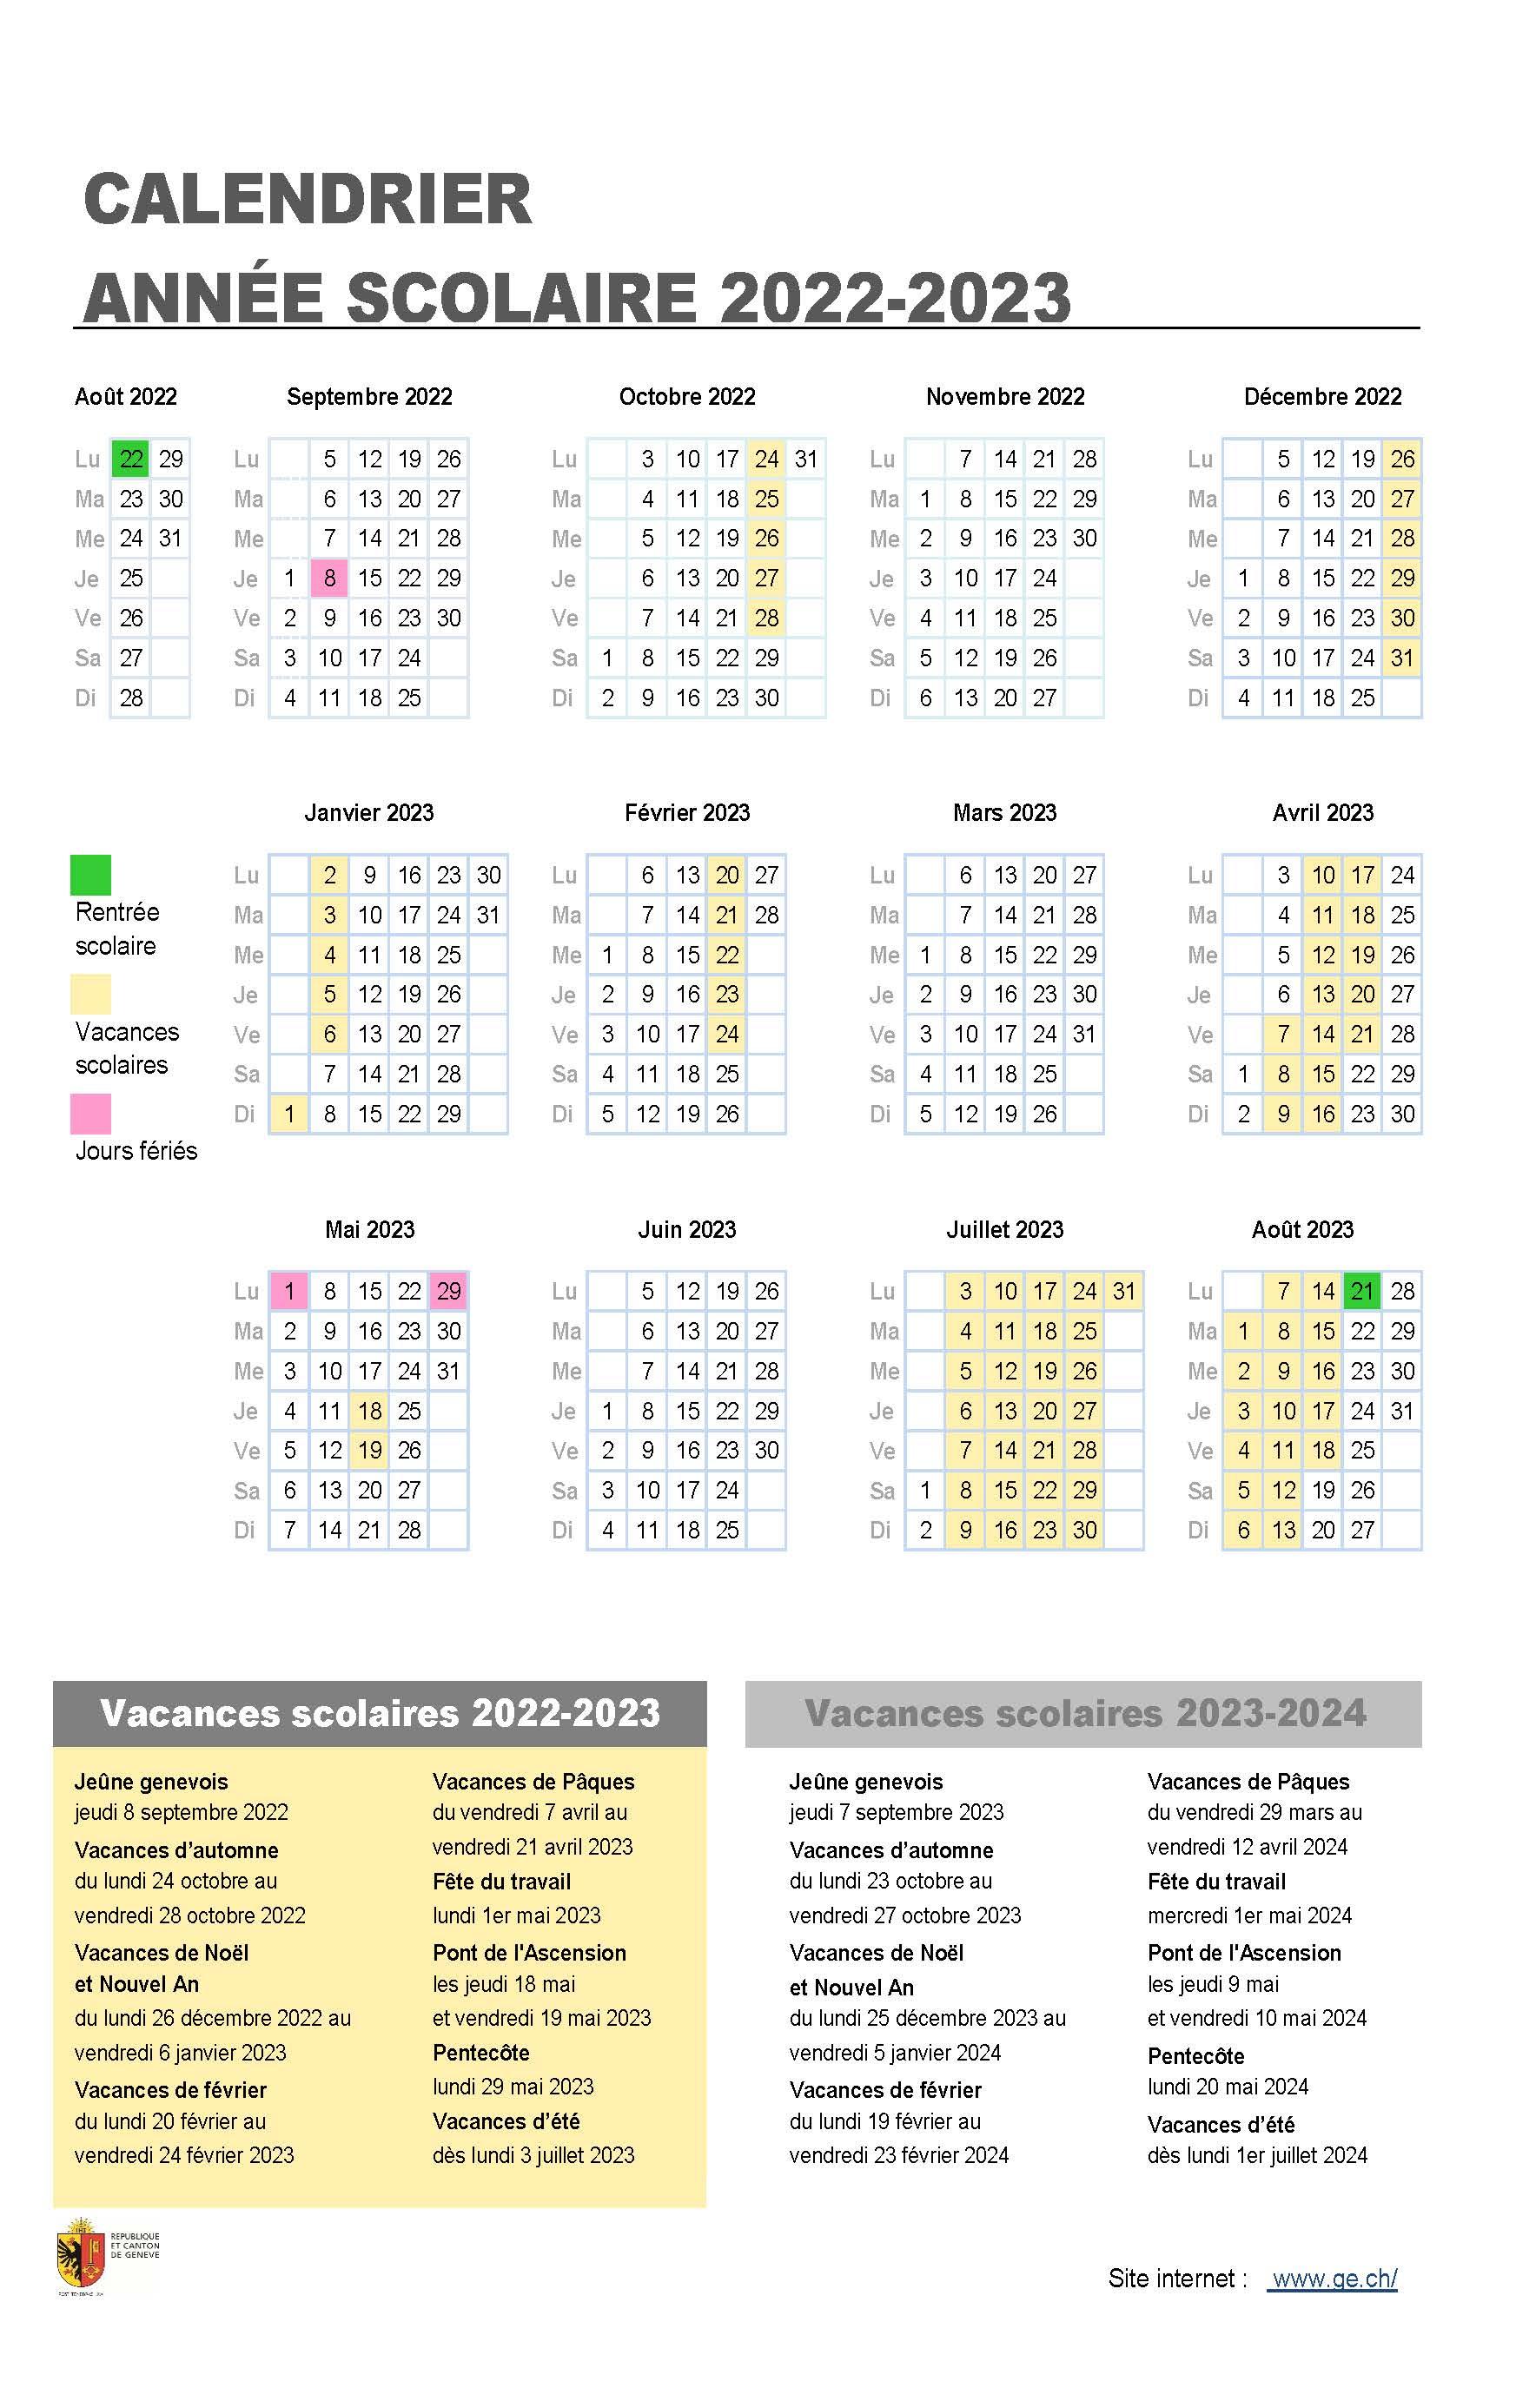 Calendrier Scolaire 2022 2023 Zone A Vacances scolaires 2022 2023 | ge.ch